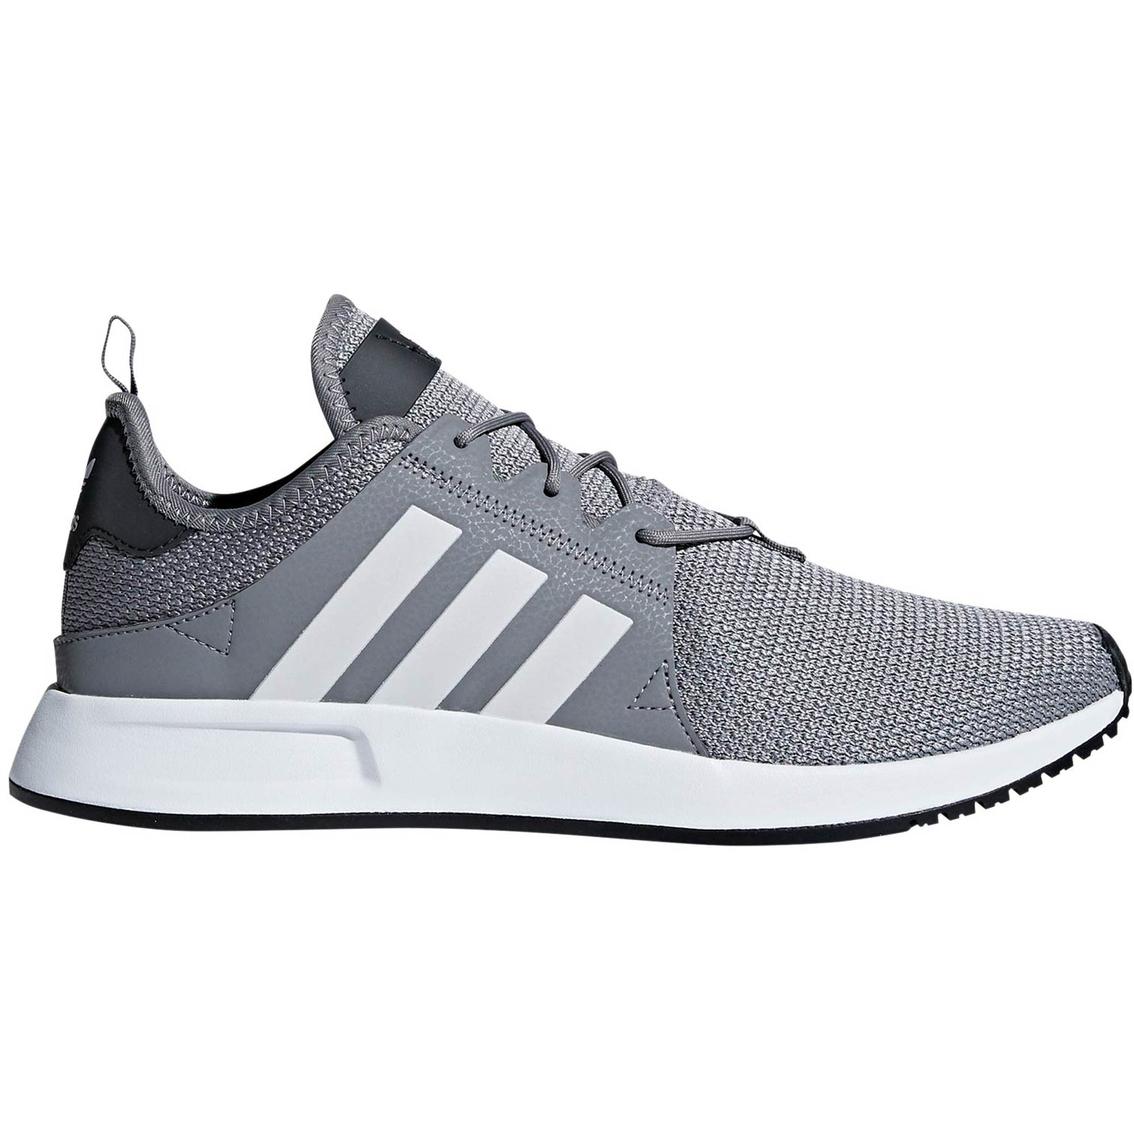 0ac9785fe0c58 Adidas Men s X Plr Running Shoes